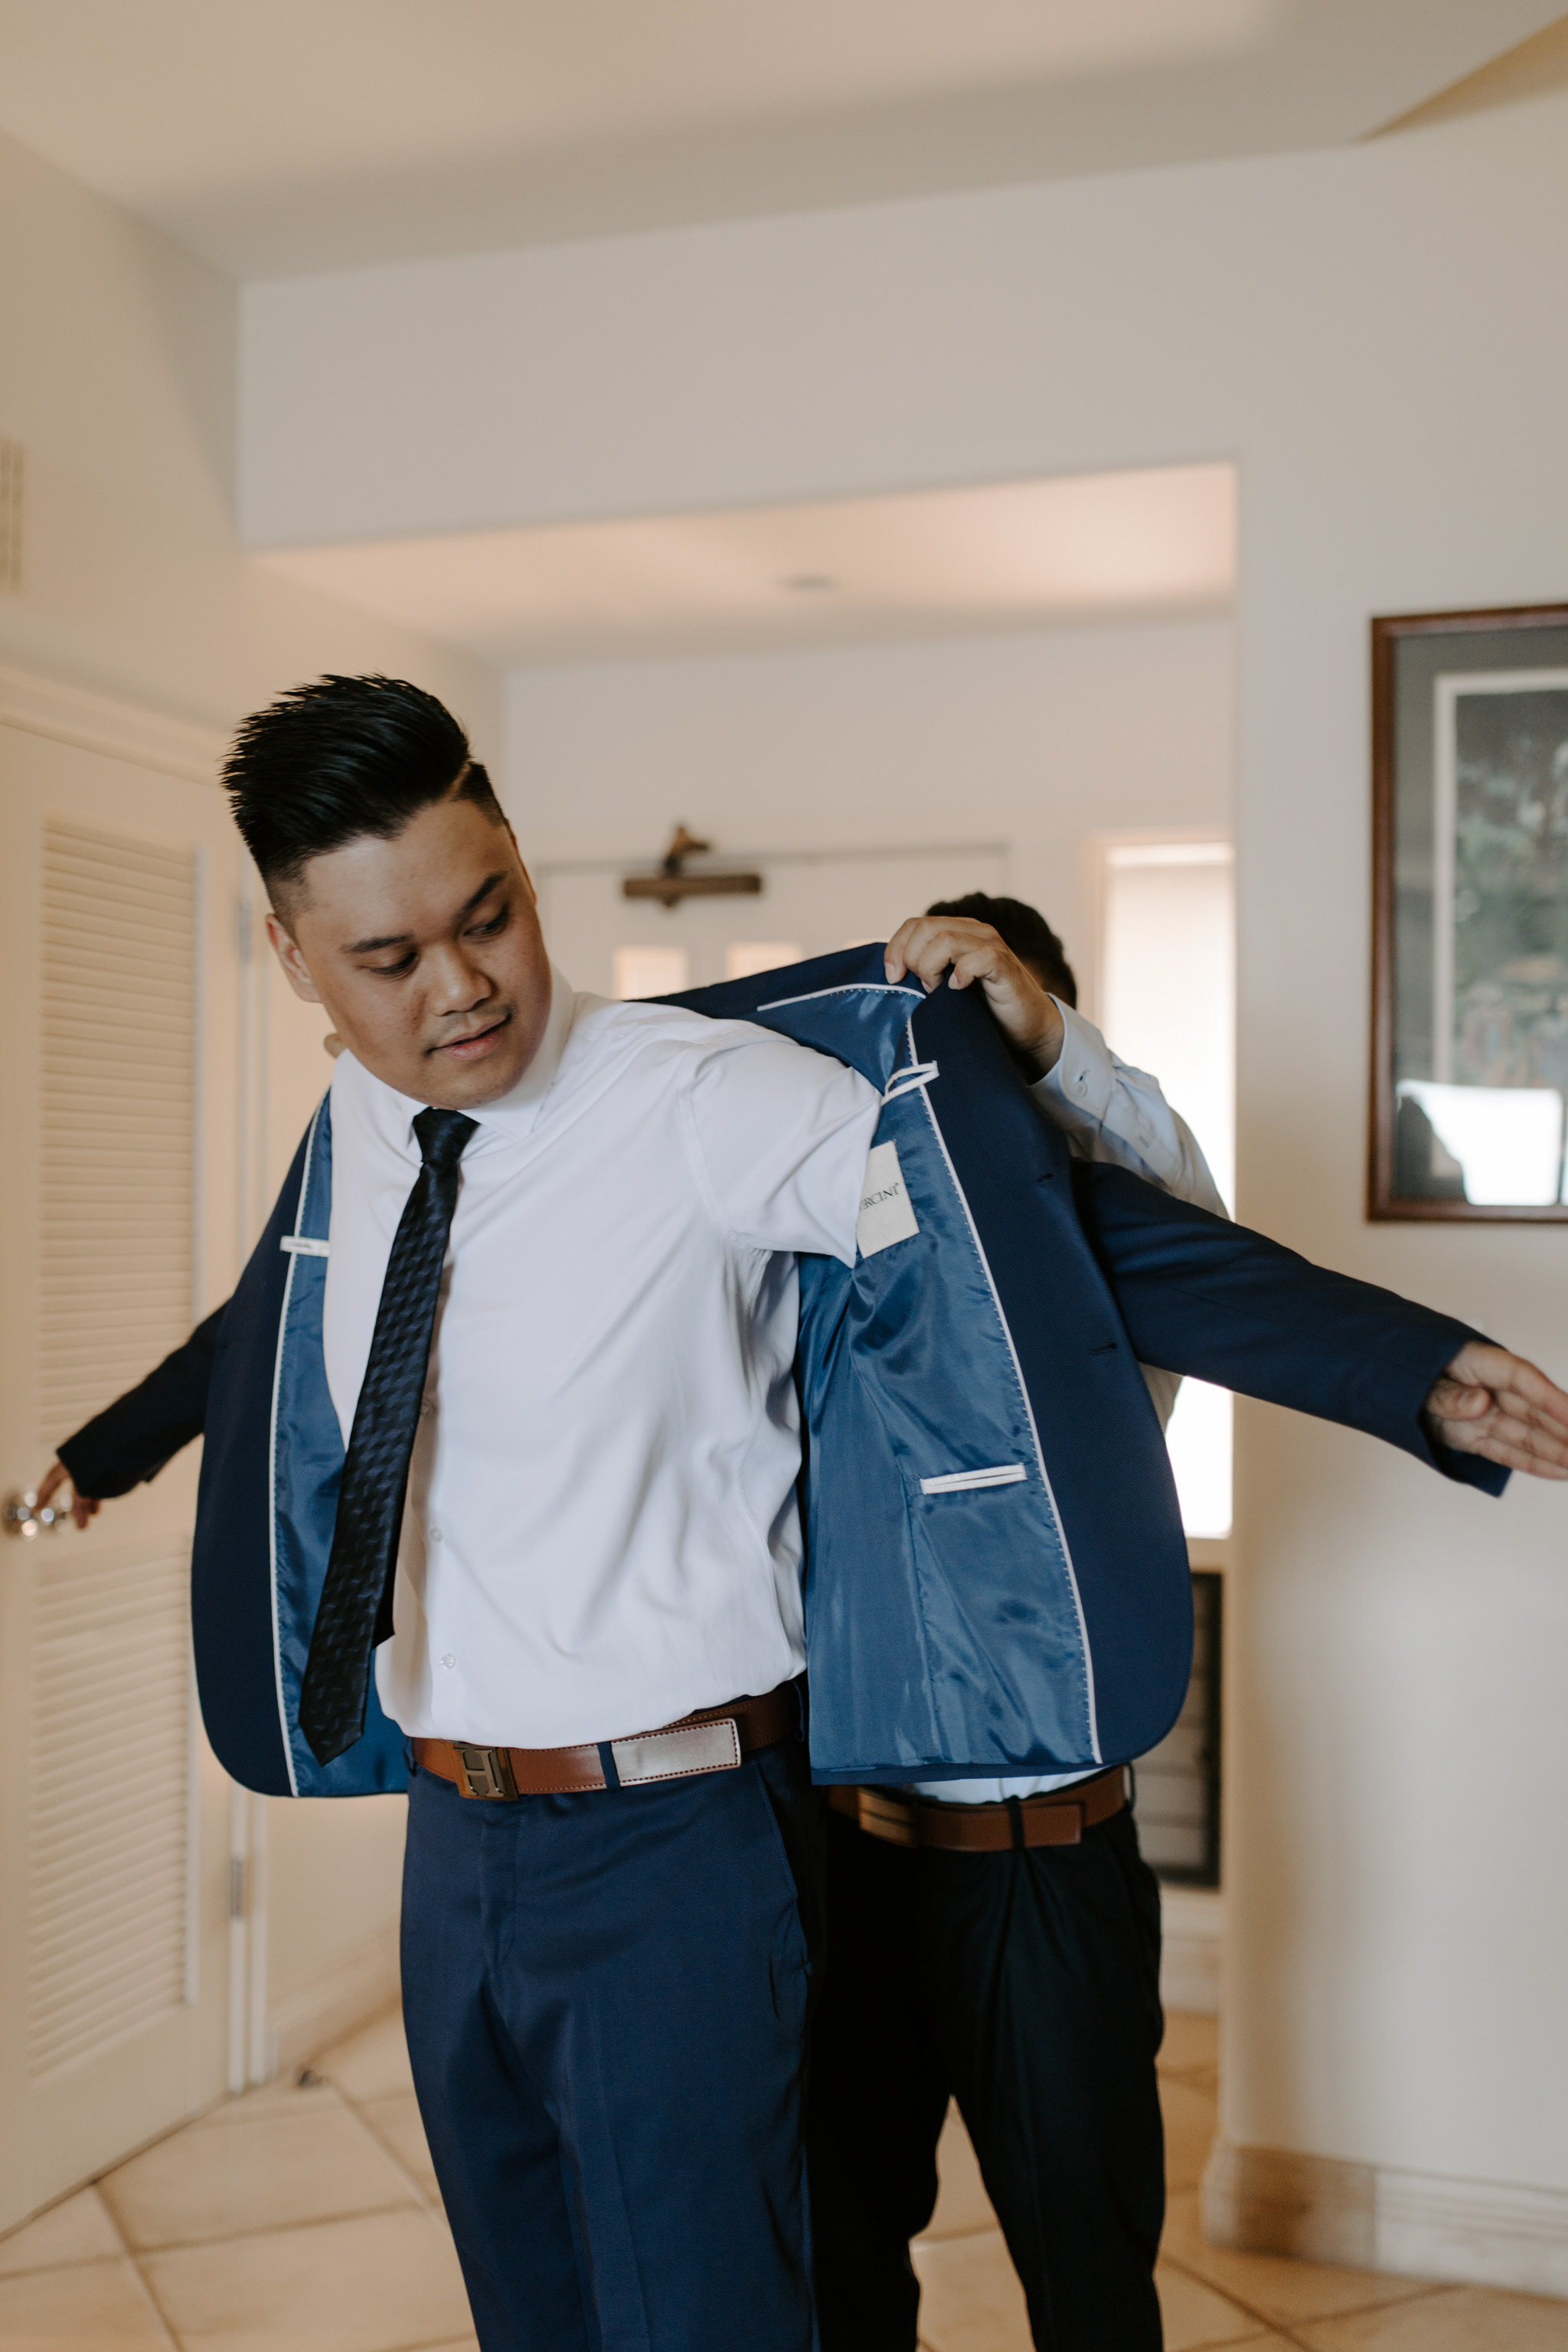 Best man helping groom put on his jacket by Maui Wedding Photographer Desiree Leilani